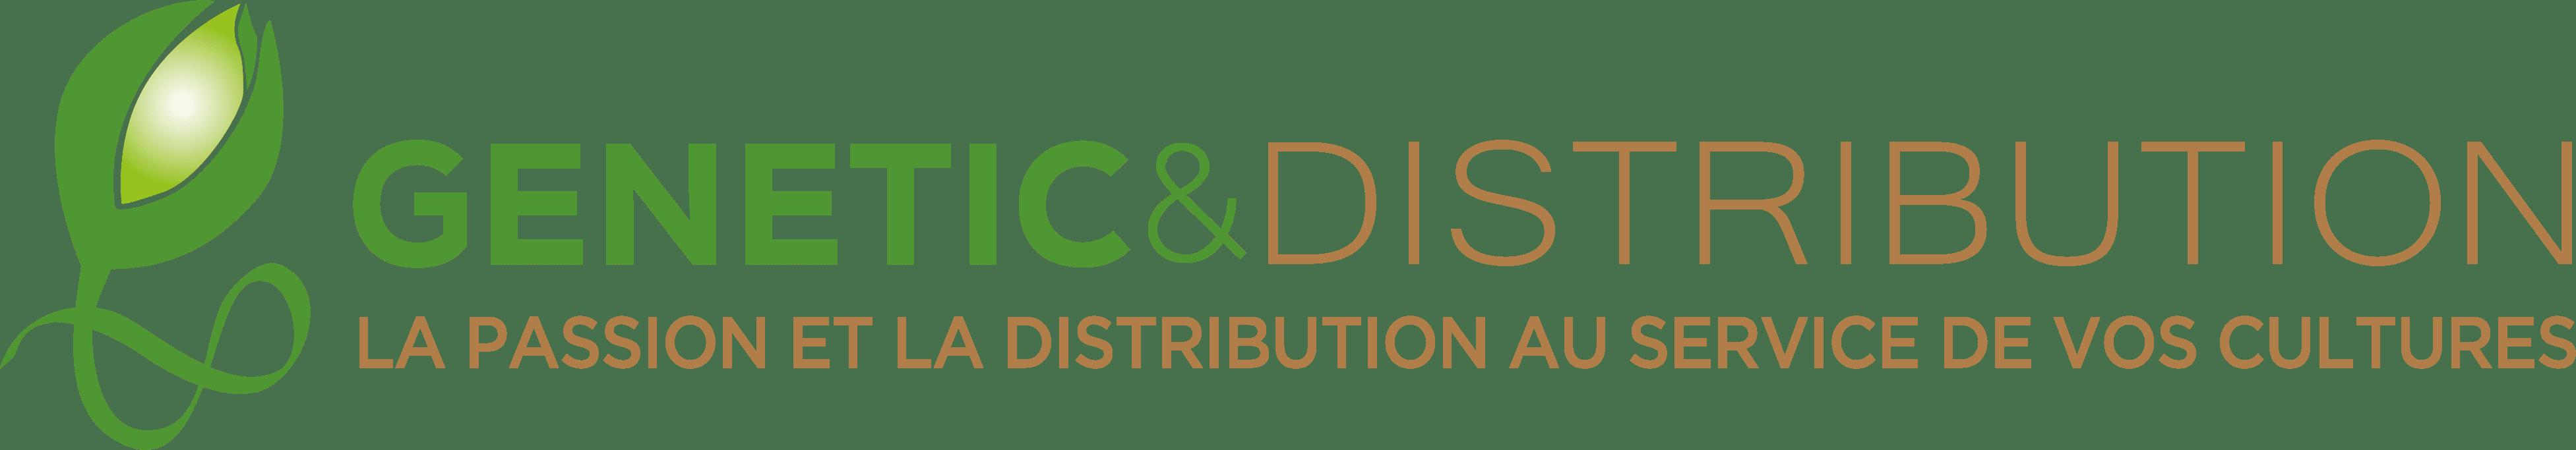 Génétic Distribution